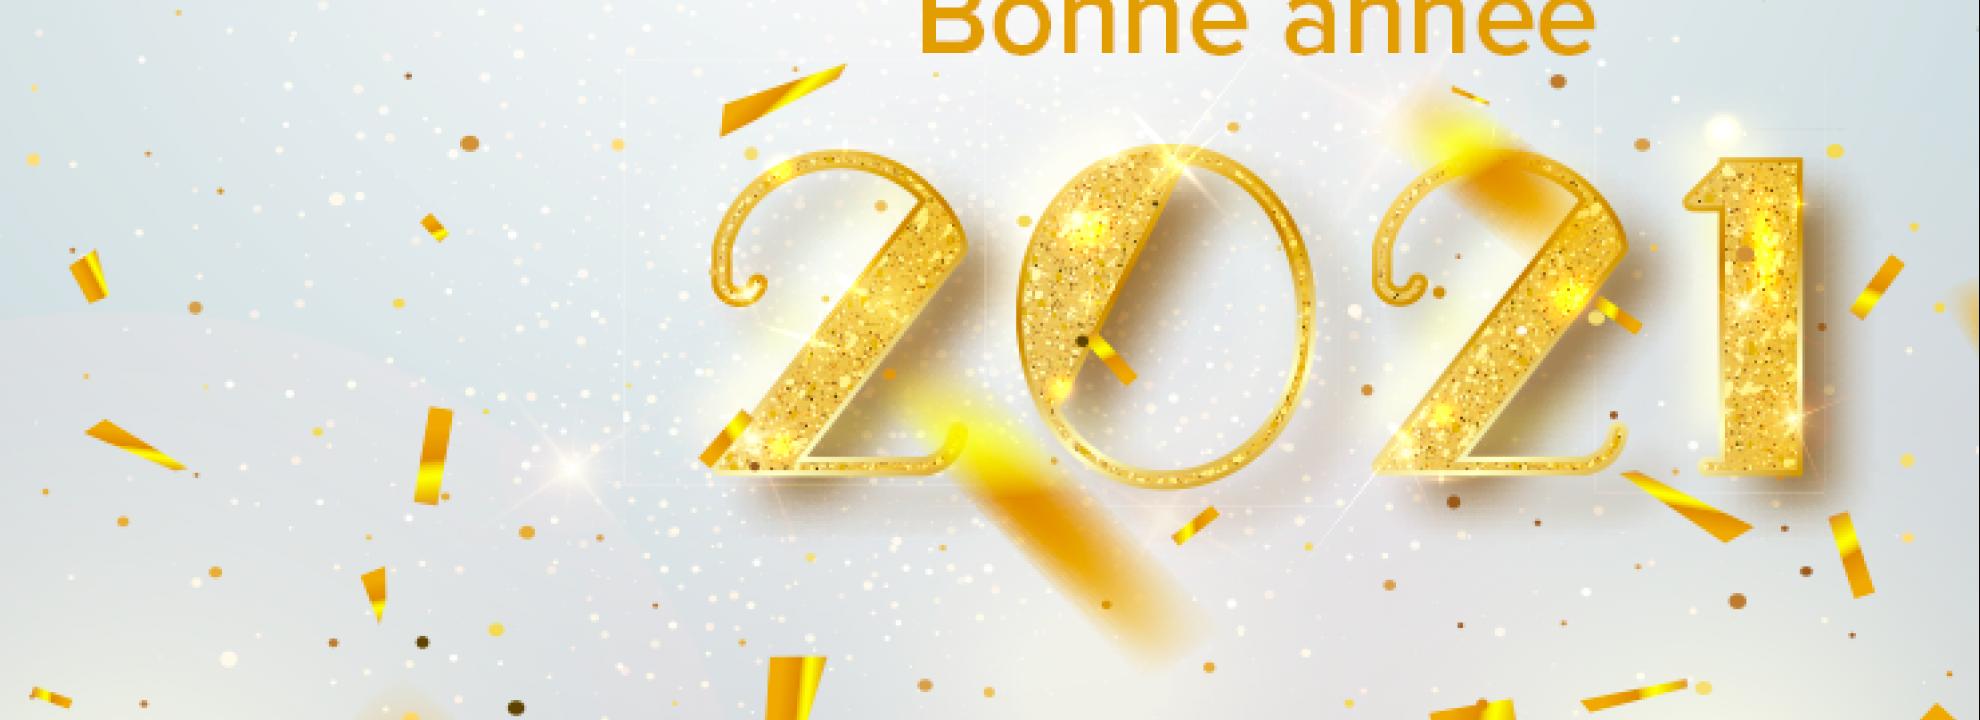 3-bonne annee-740-500